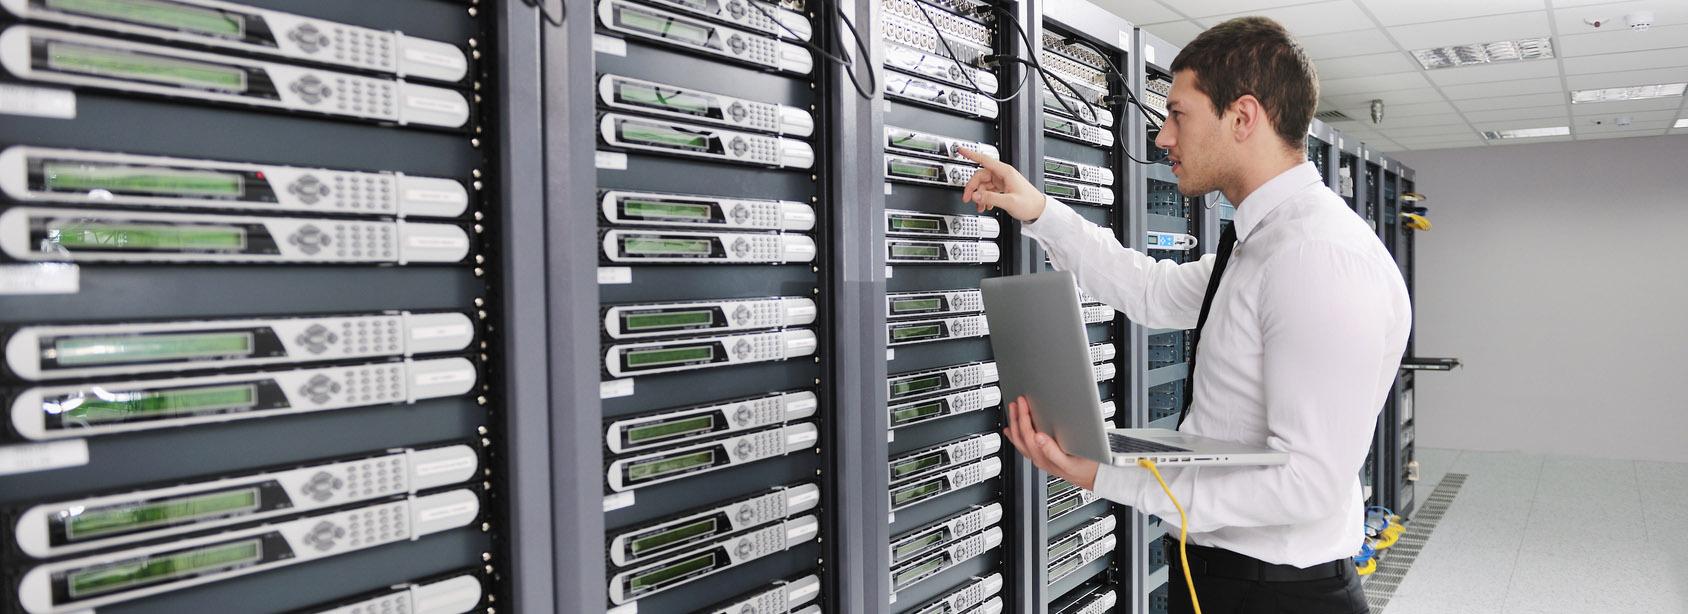 Server-Management1